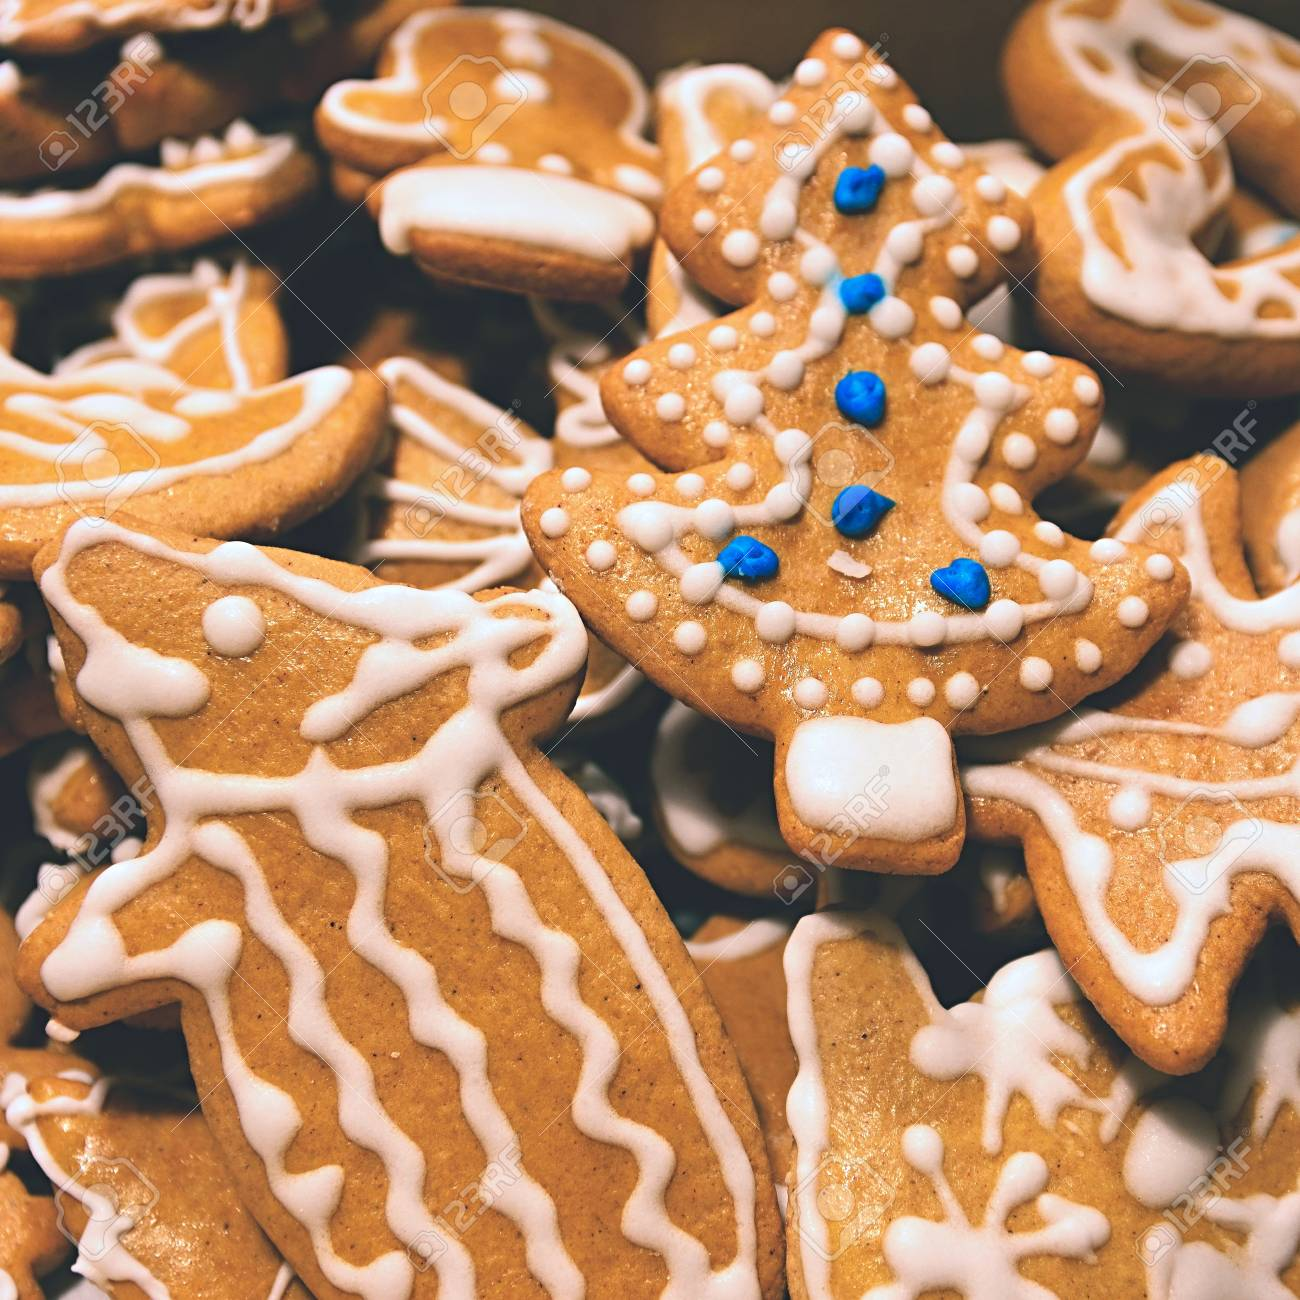 Christmas Sweets.Christmas Sweets Traditional Homemade Handmade Czech Sweets